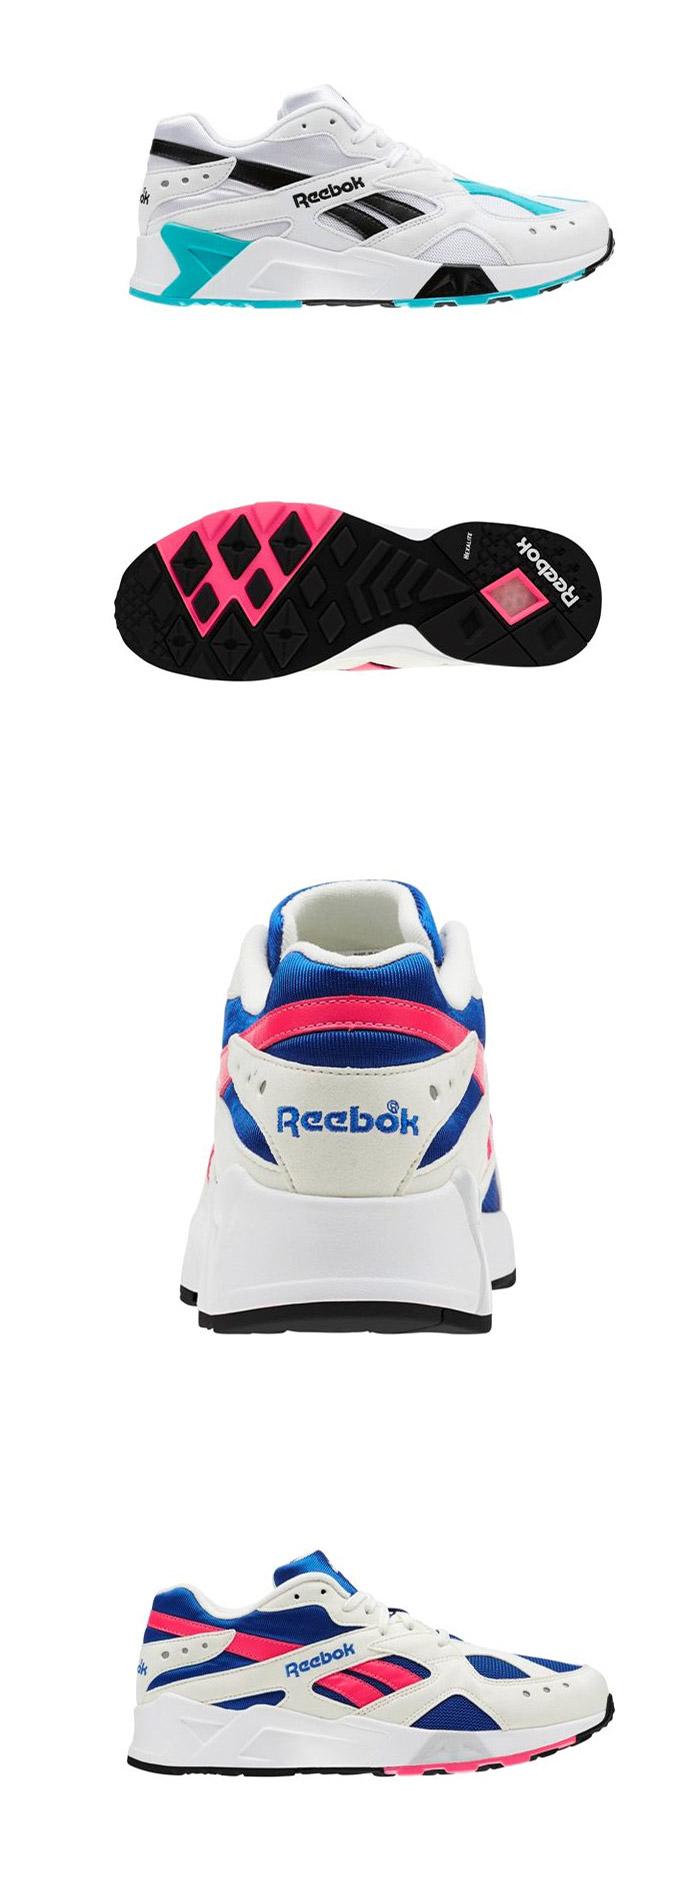 wanna_reebok_shoes_02.jpg